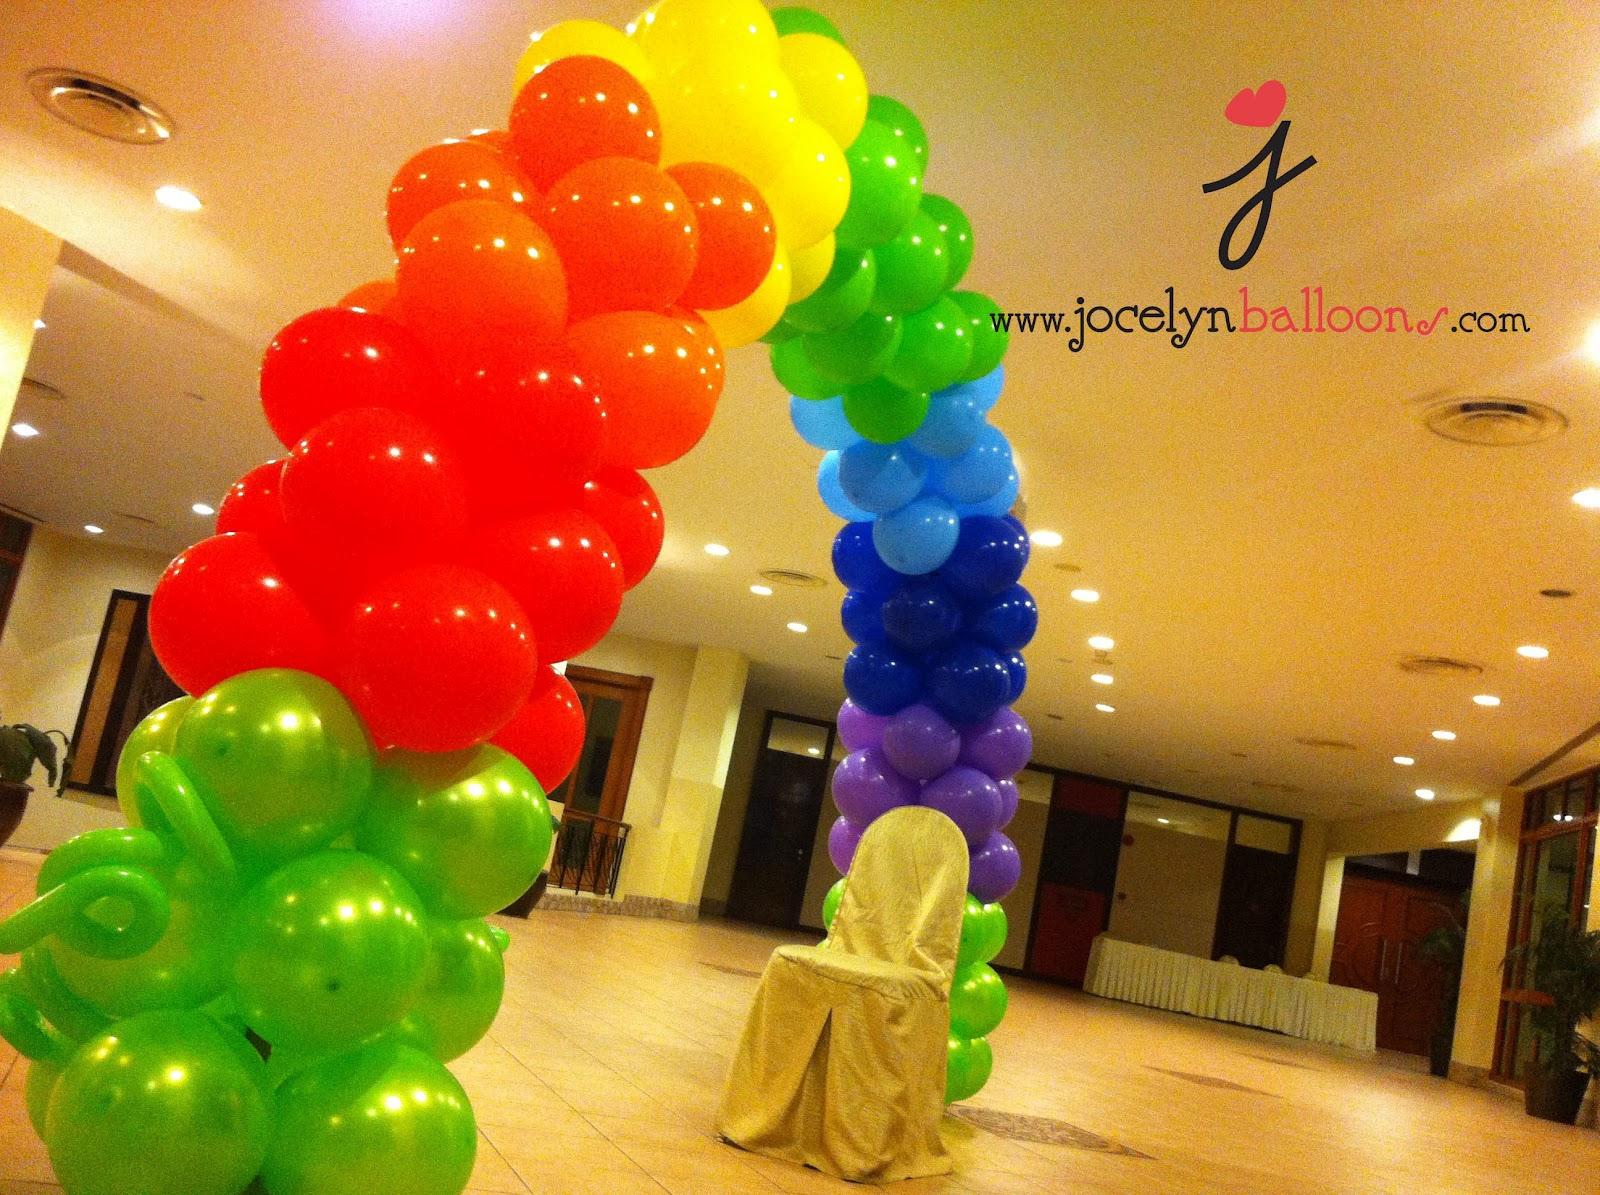 jocelyn ng professional balloon artist blog balloon sculpting singapore september 2012. Black Bedroom Furniture Sets. Home Design Ideas